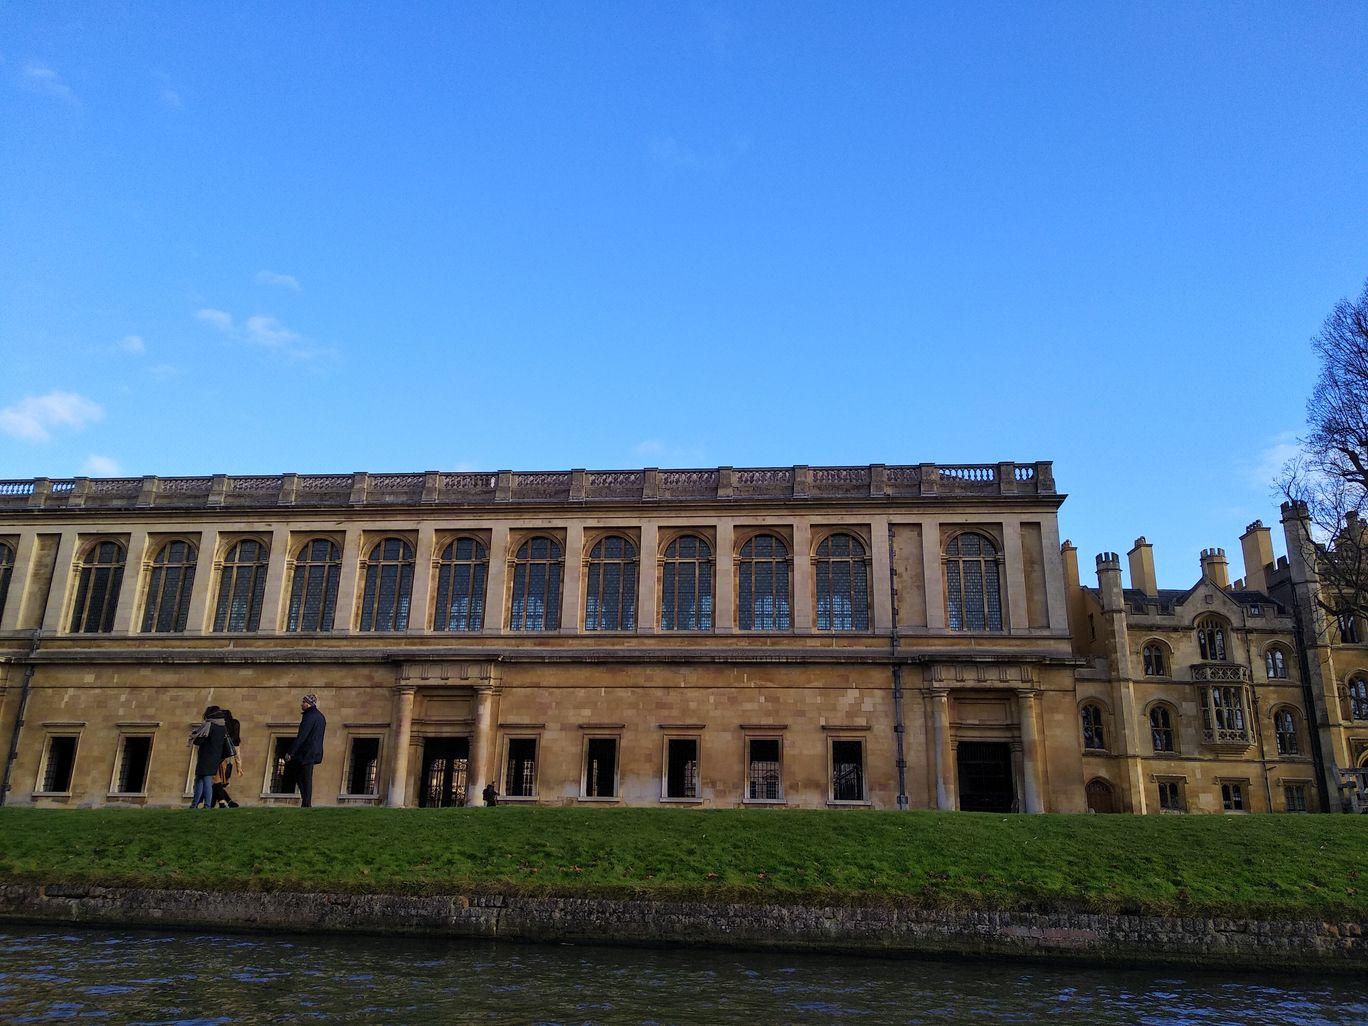 Photo of Cambridge By Sumukh Herlekar